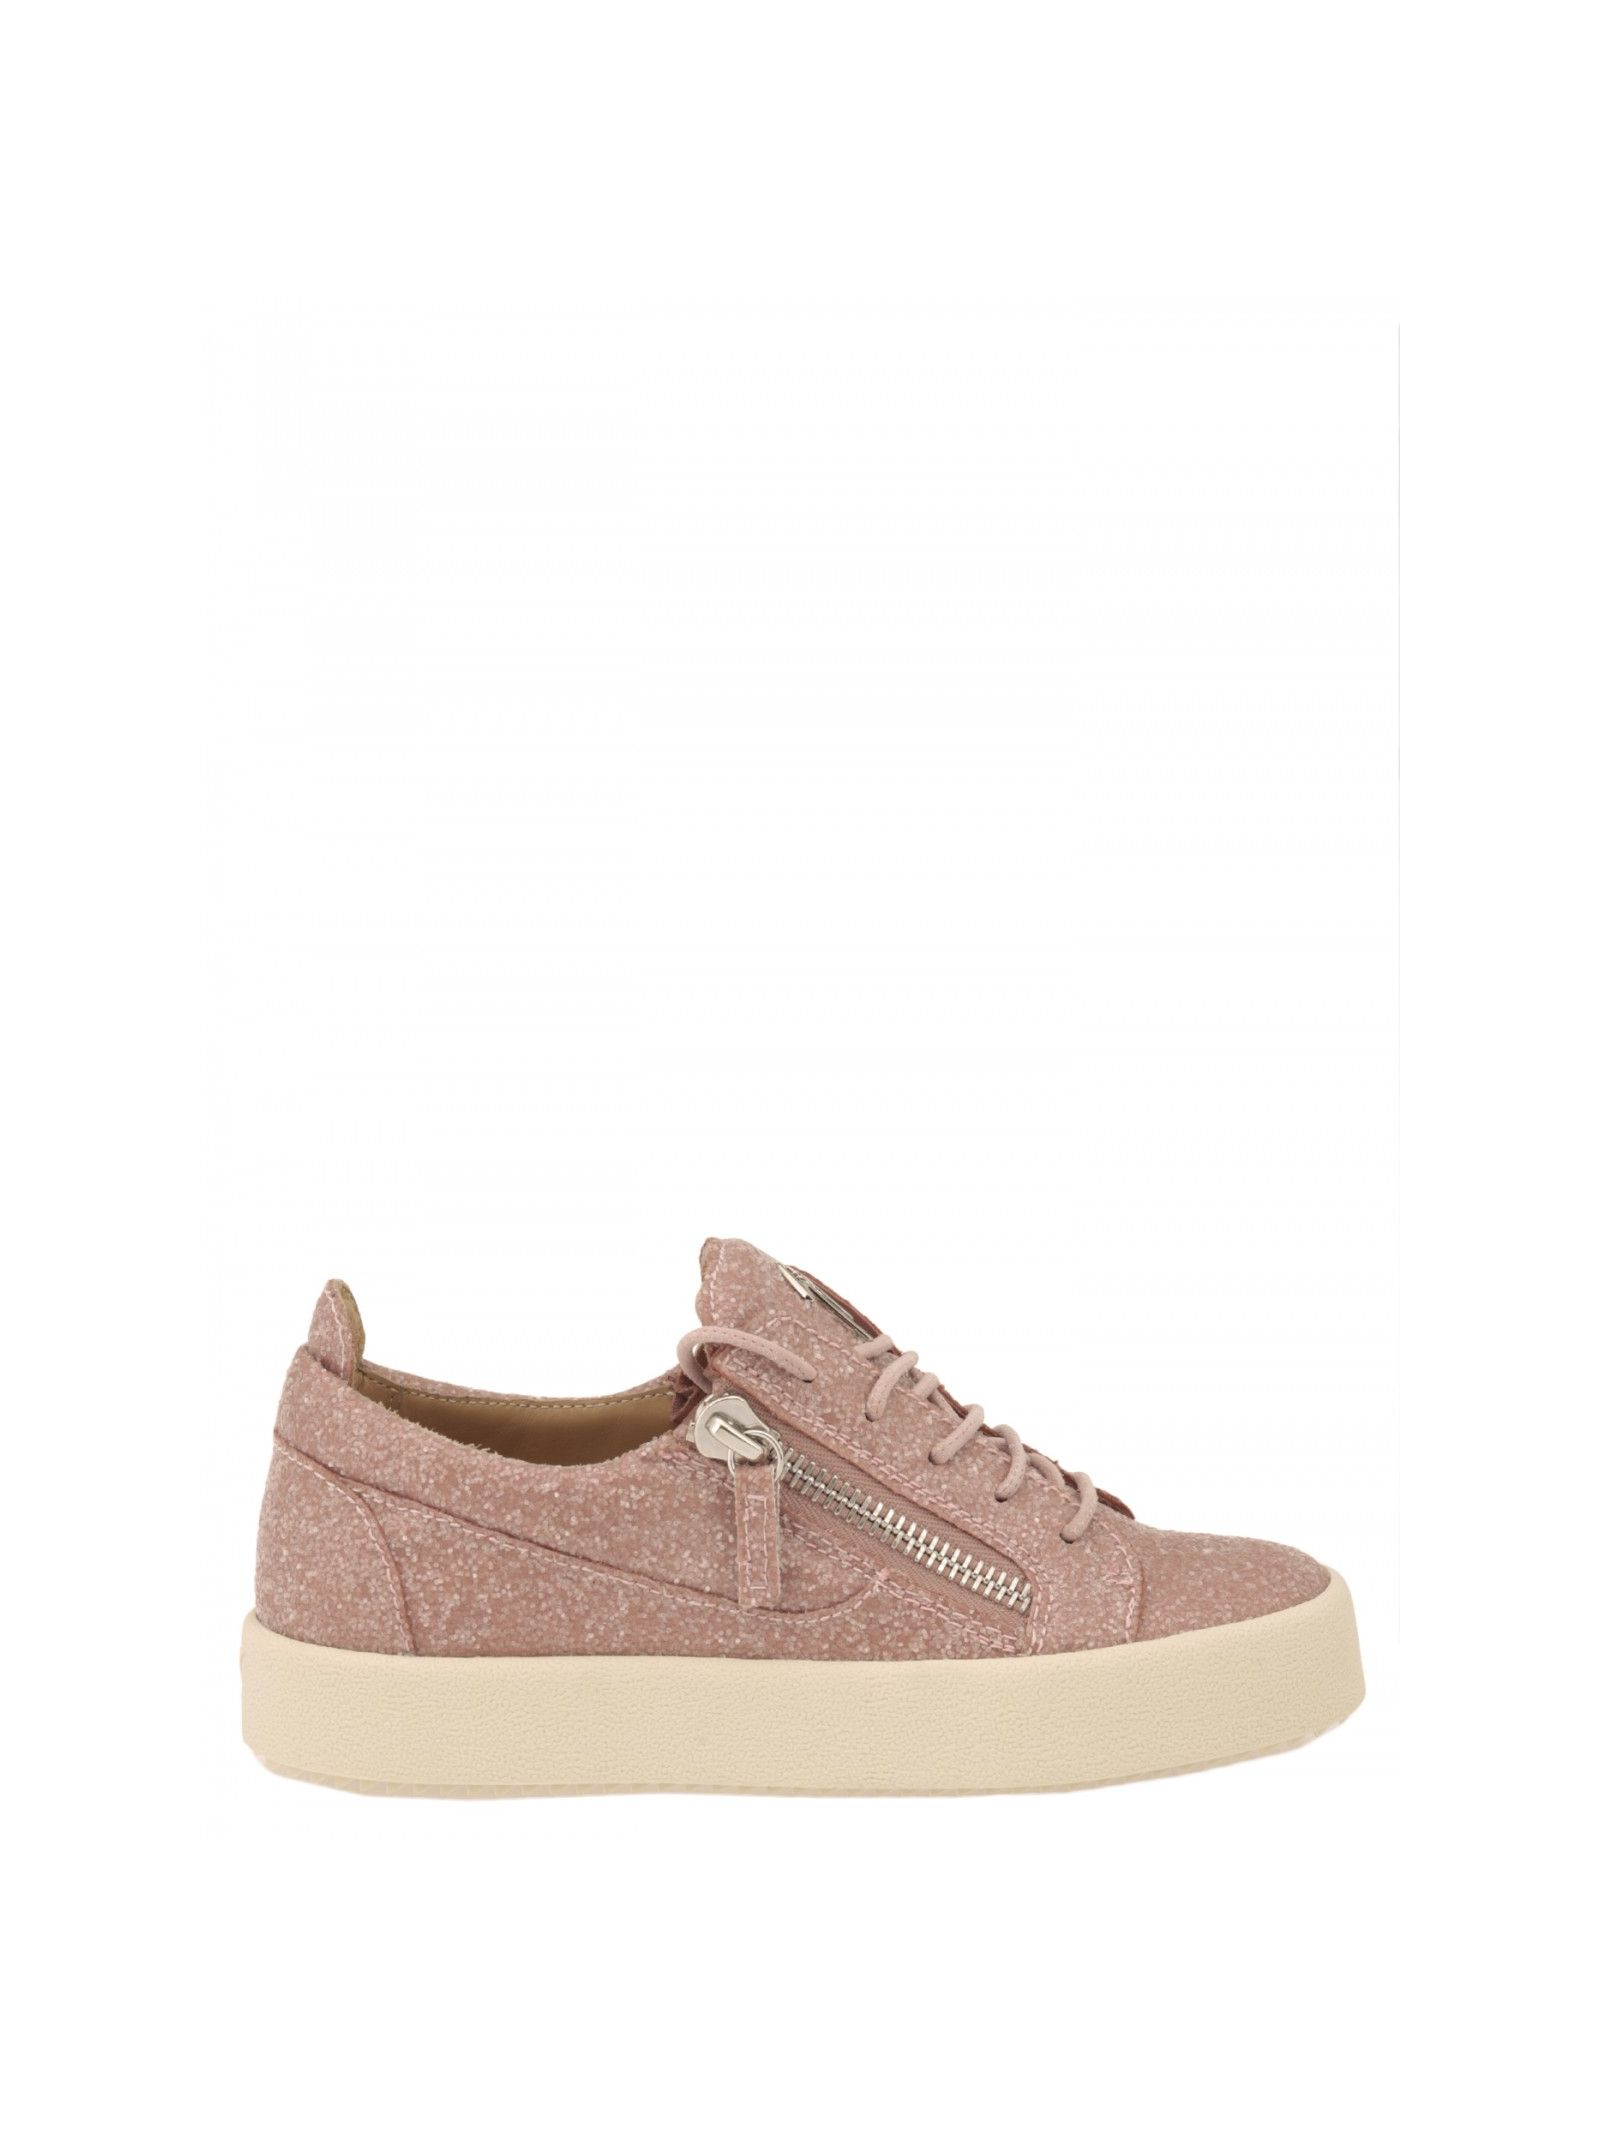 giuseppe zanotti female giuseppe zanotti design glitter sneakers